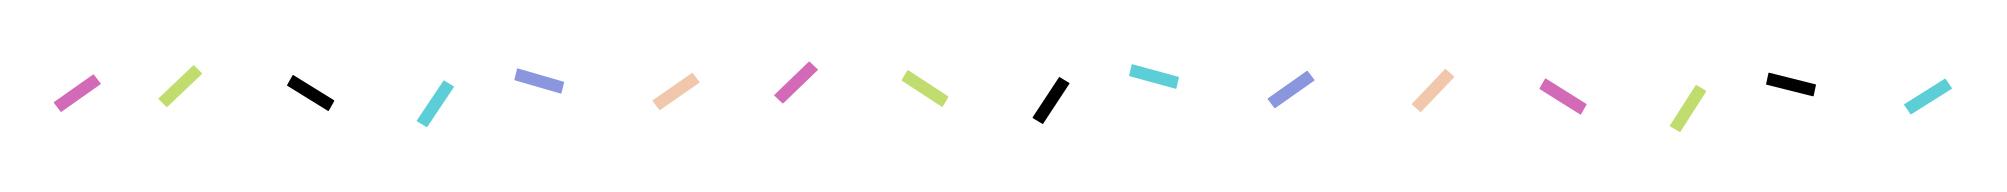 cleo-banner-colourful-new.jpg